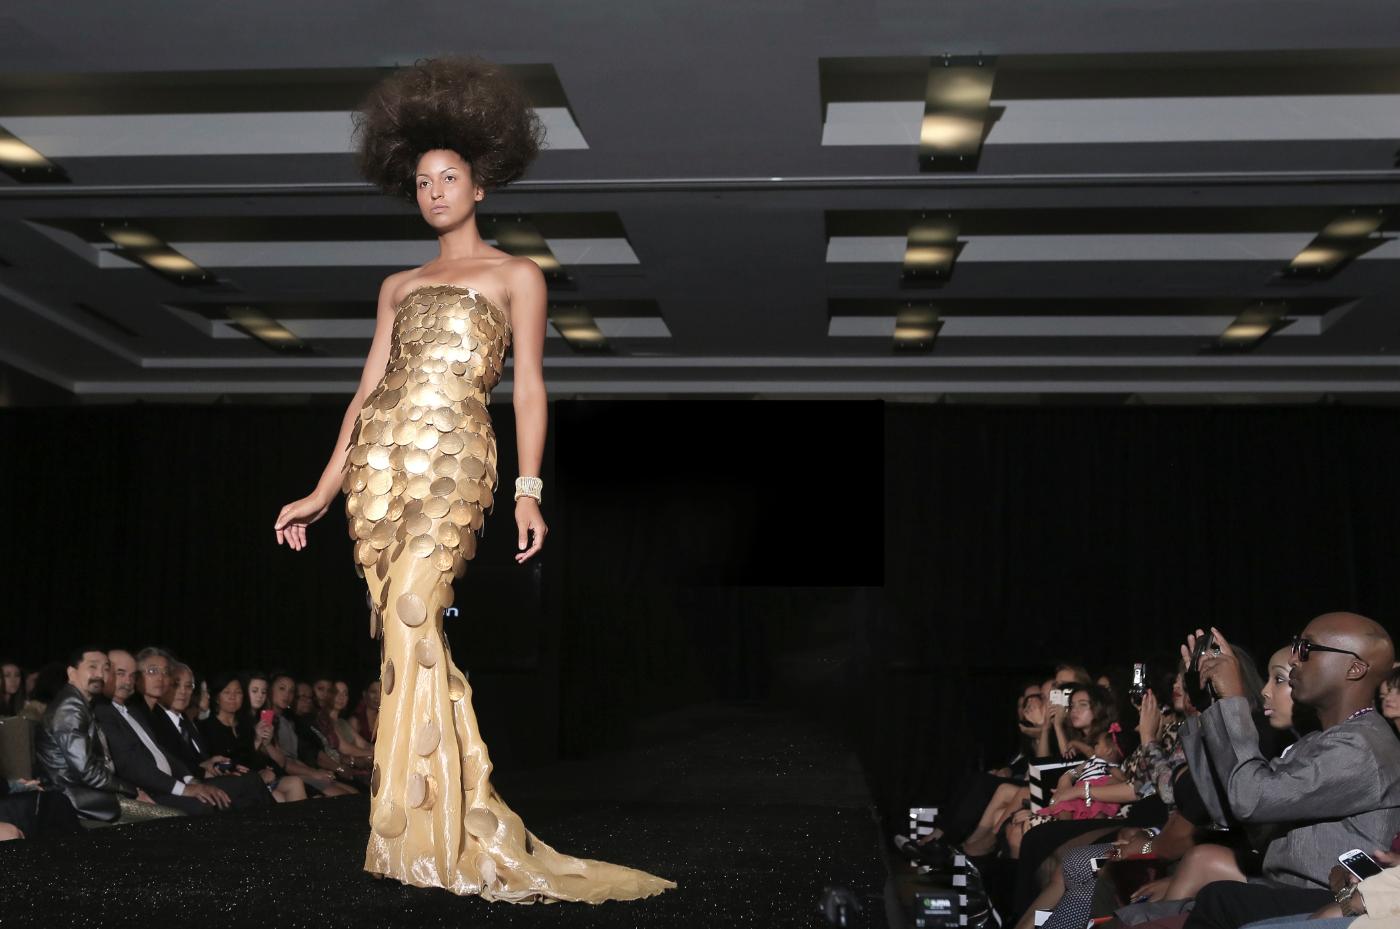 FOTS 2013 Designer Colleen Quen